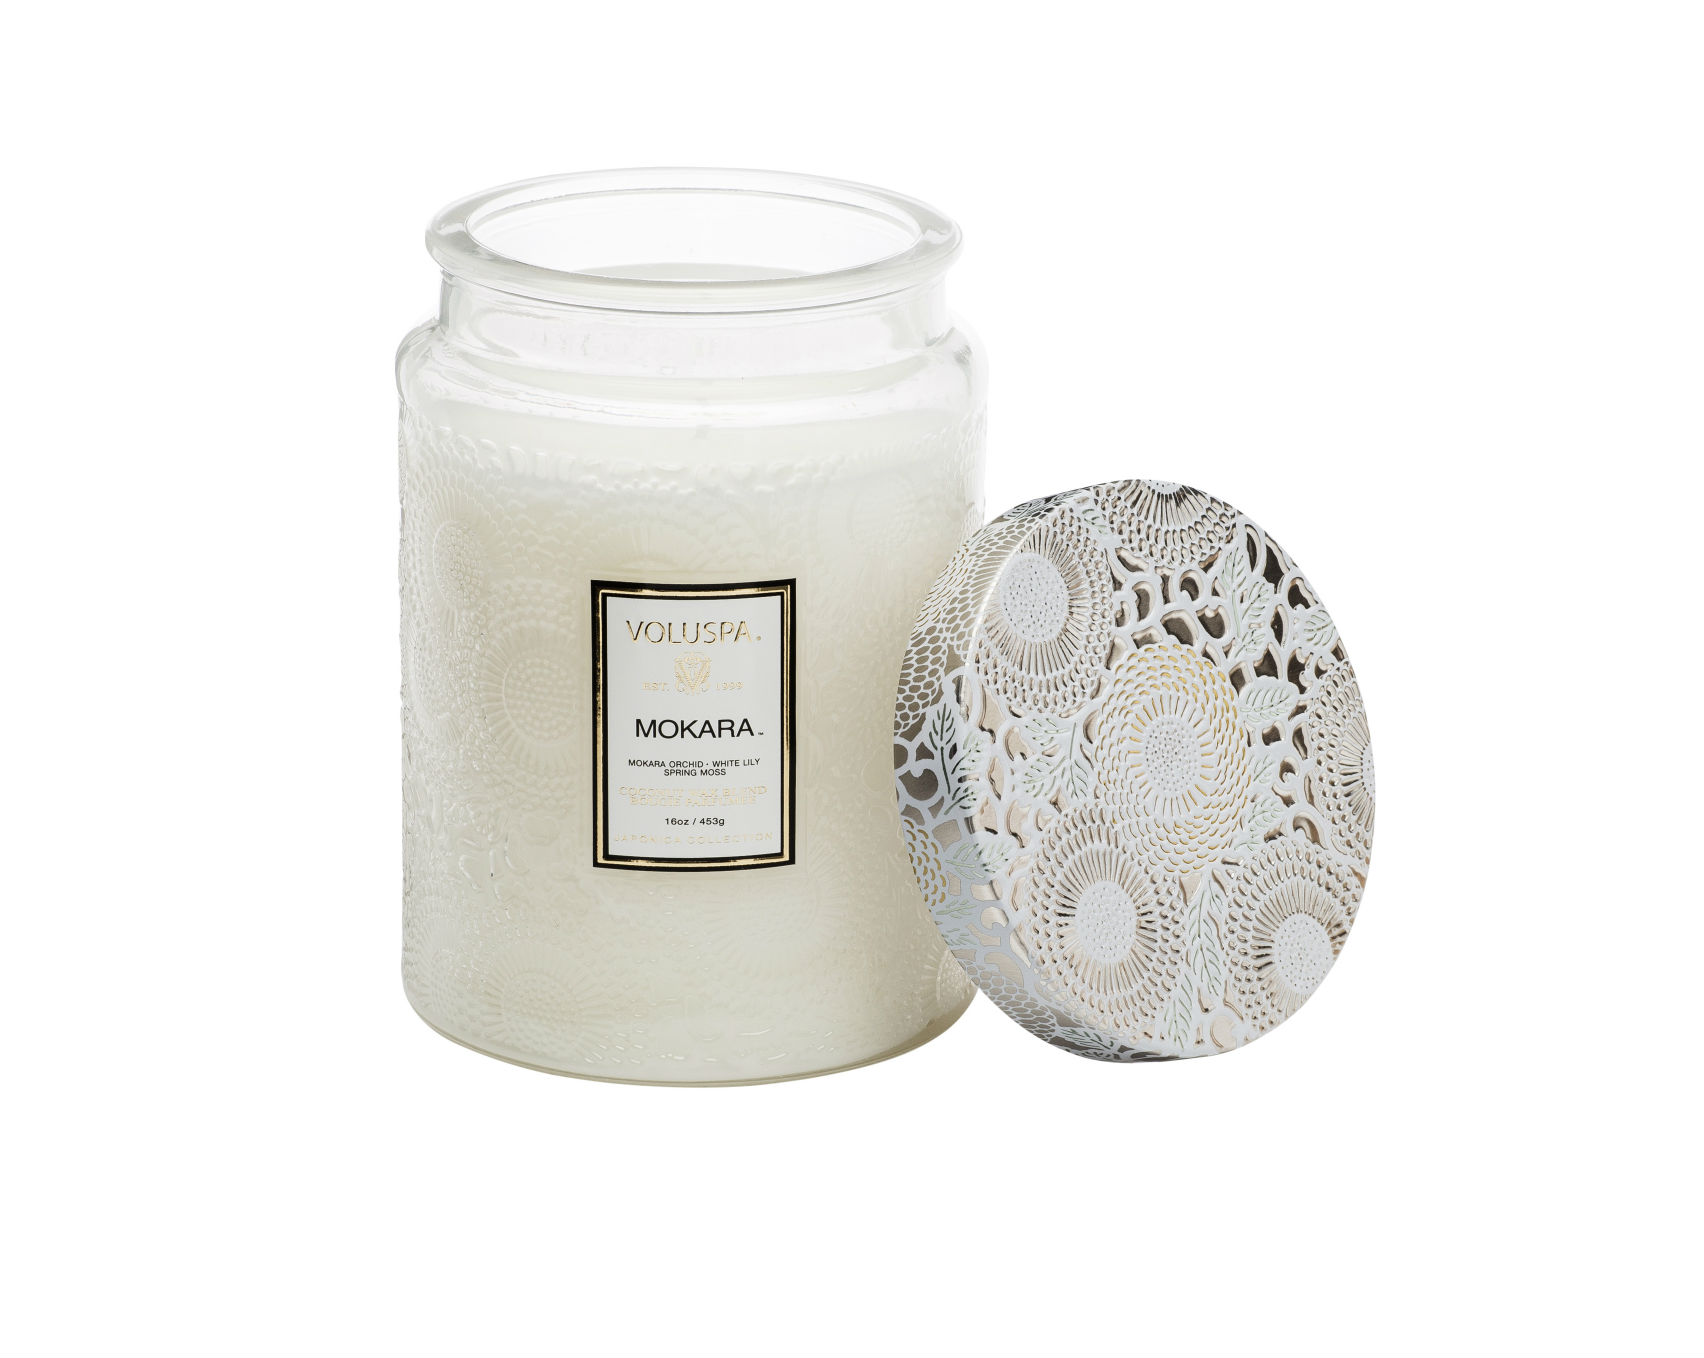 Voluspa Mokara Large Embossed Glass Jar Candle